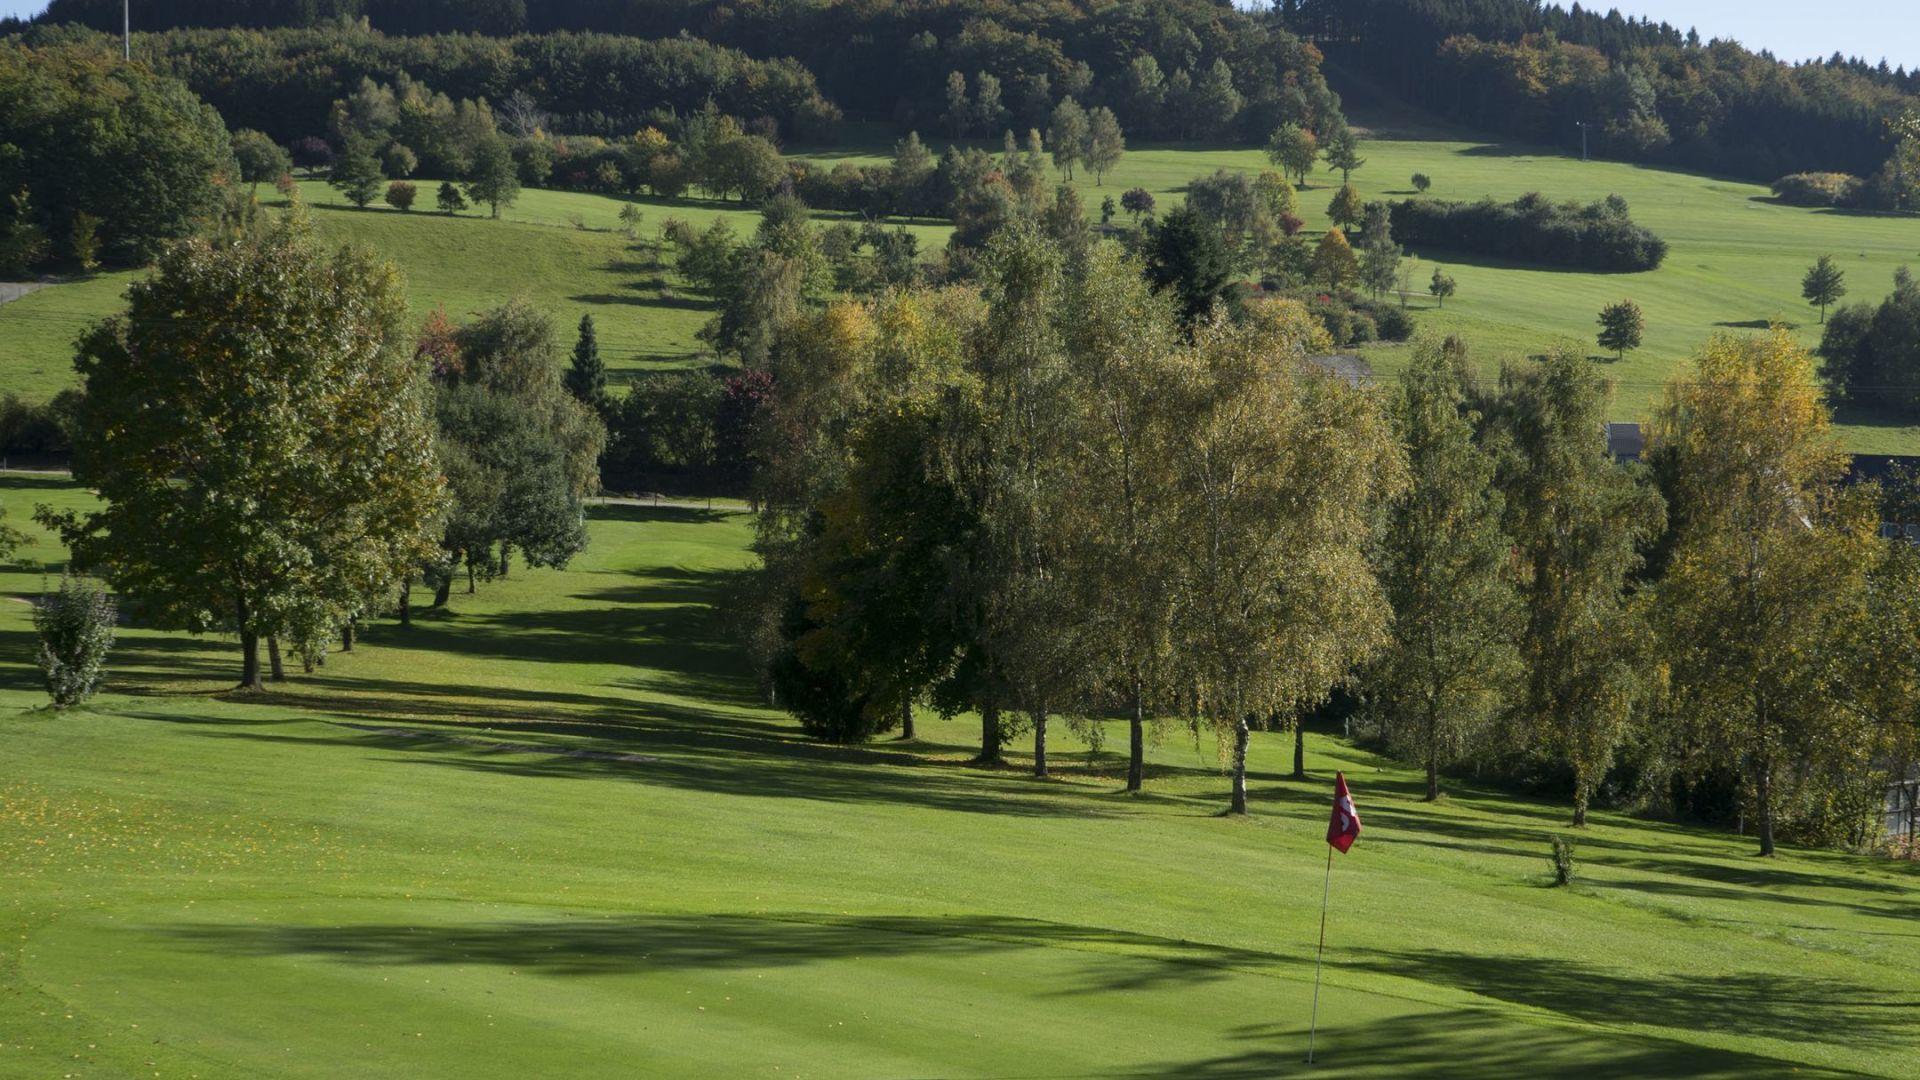 Golfplatz in Schmallenberg-Sellinghausen